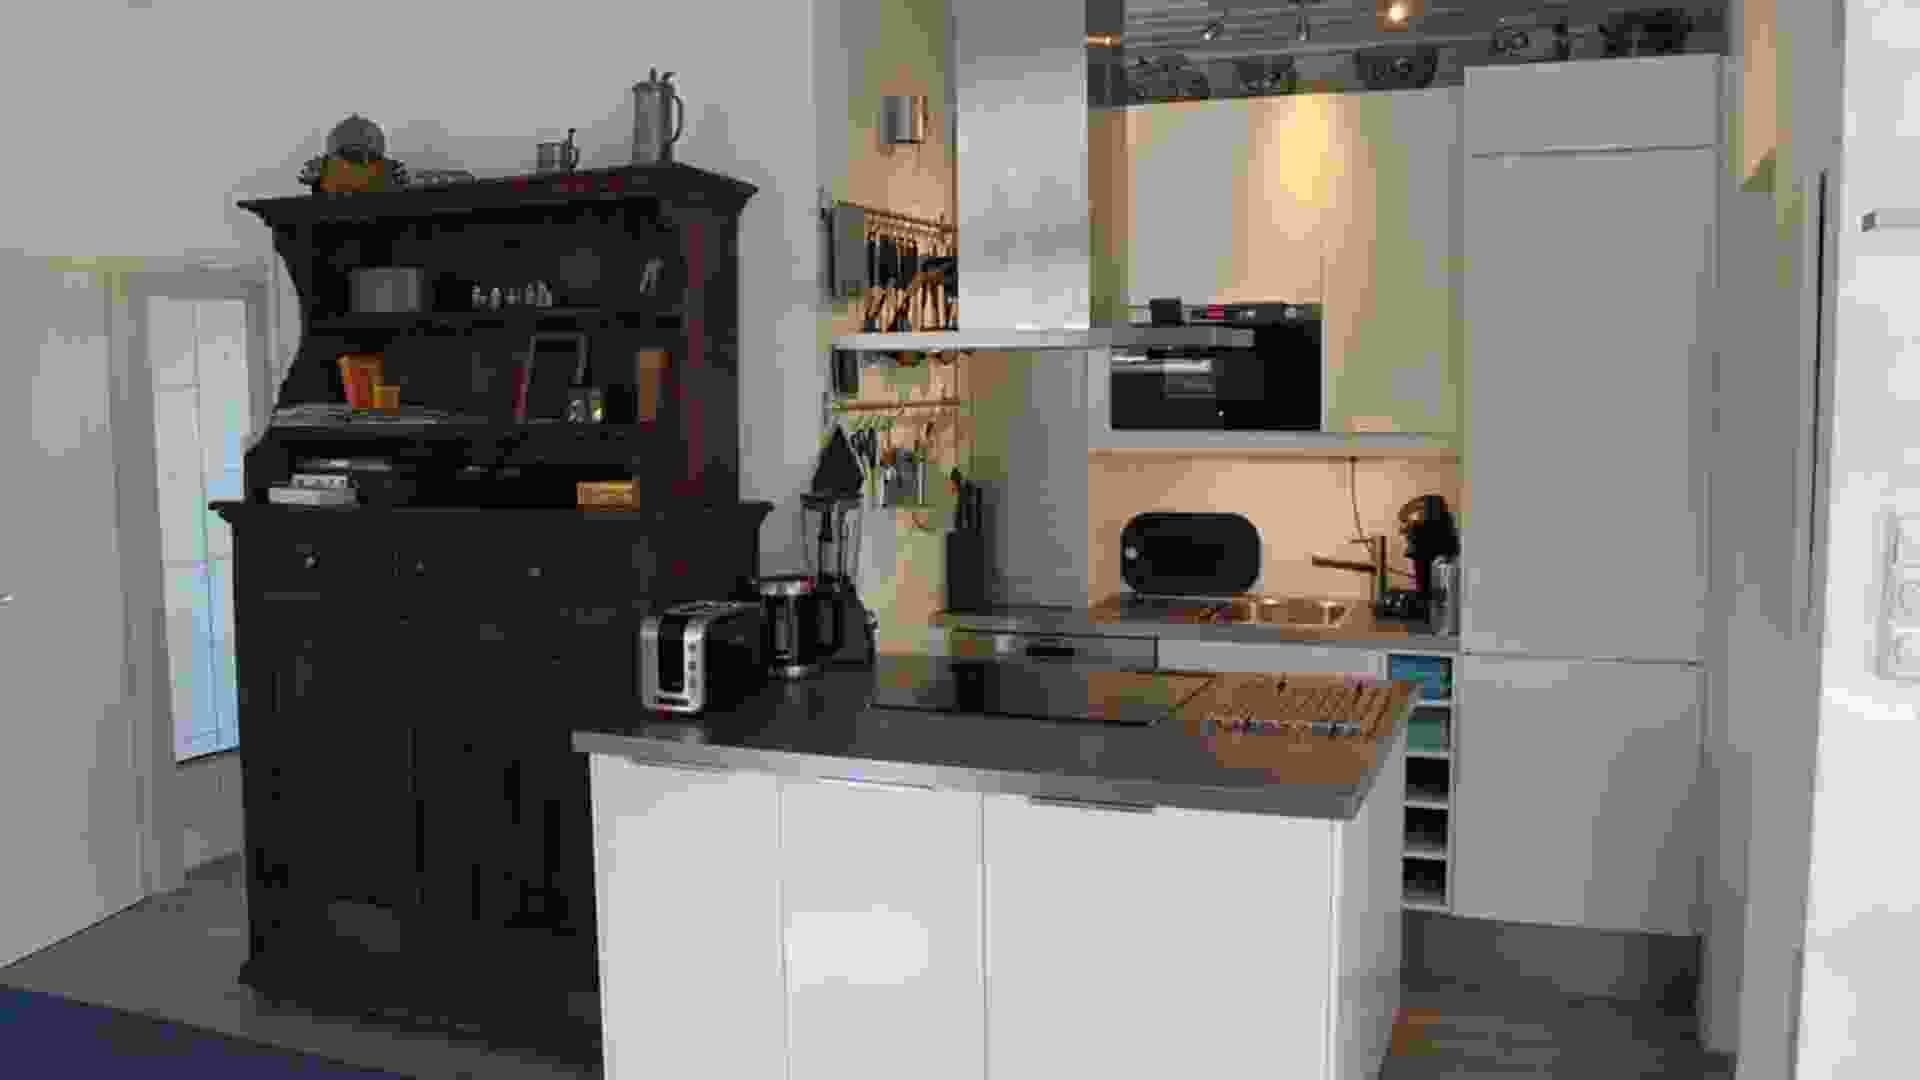 Foto 6, keuken